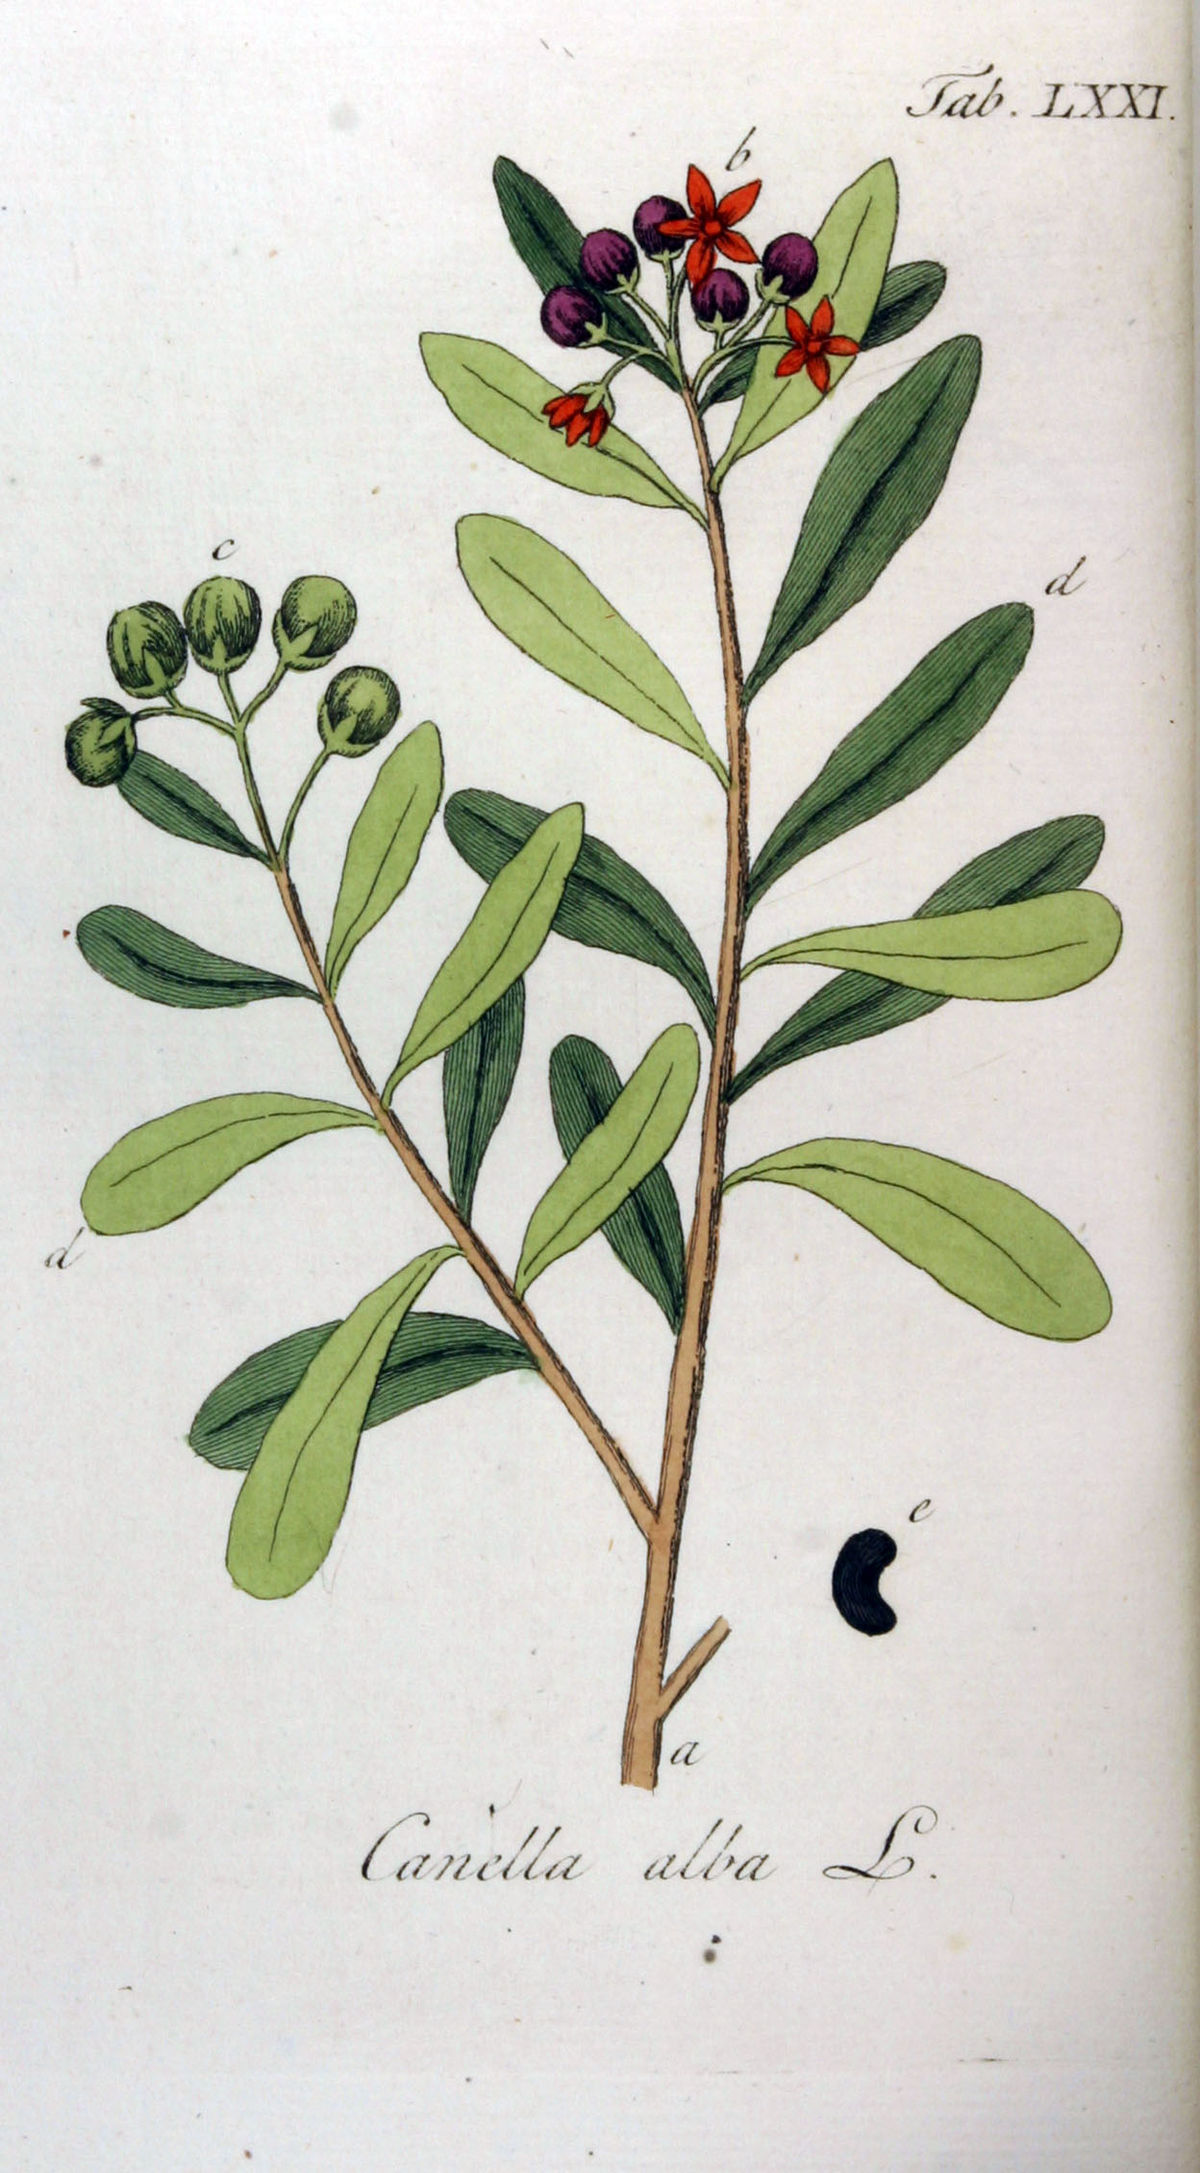 Evergreen Flowering Plants